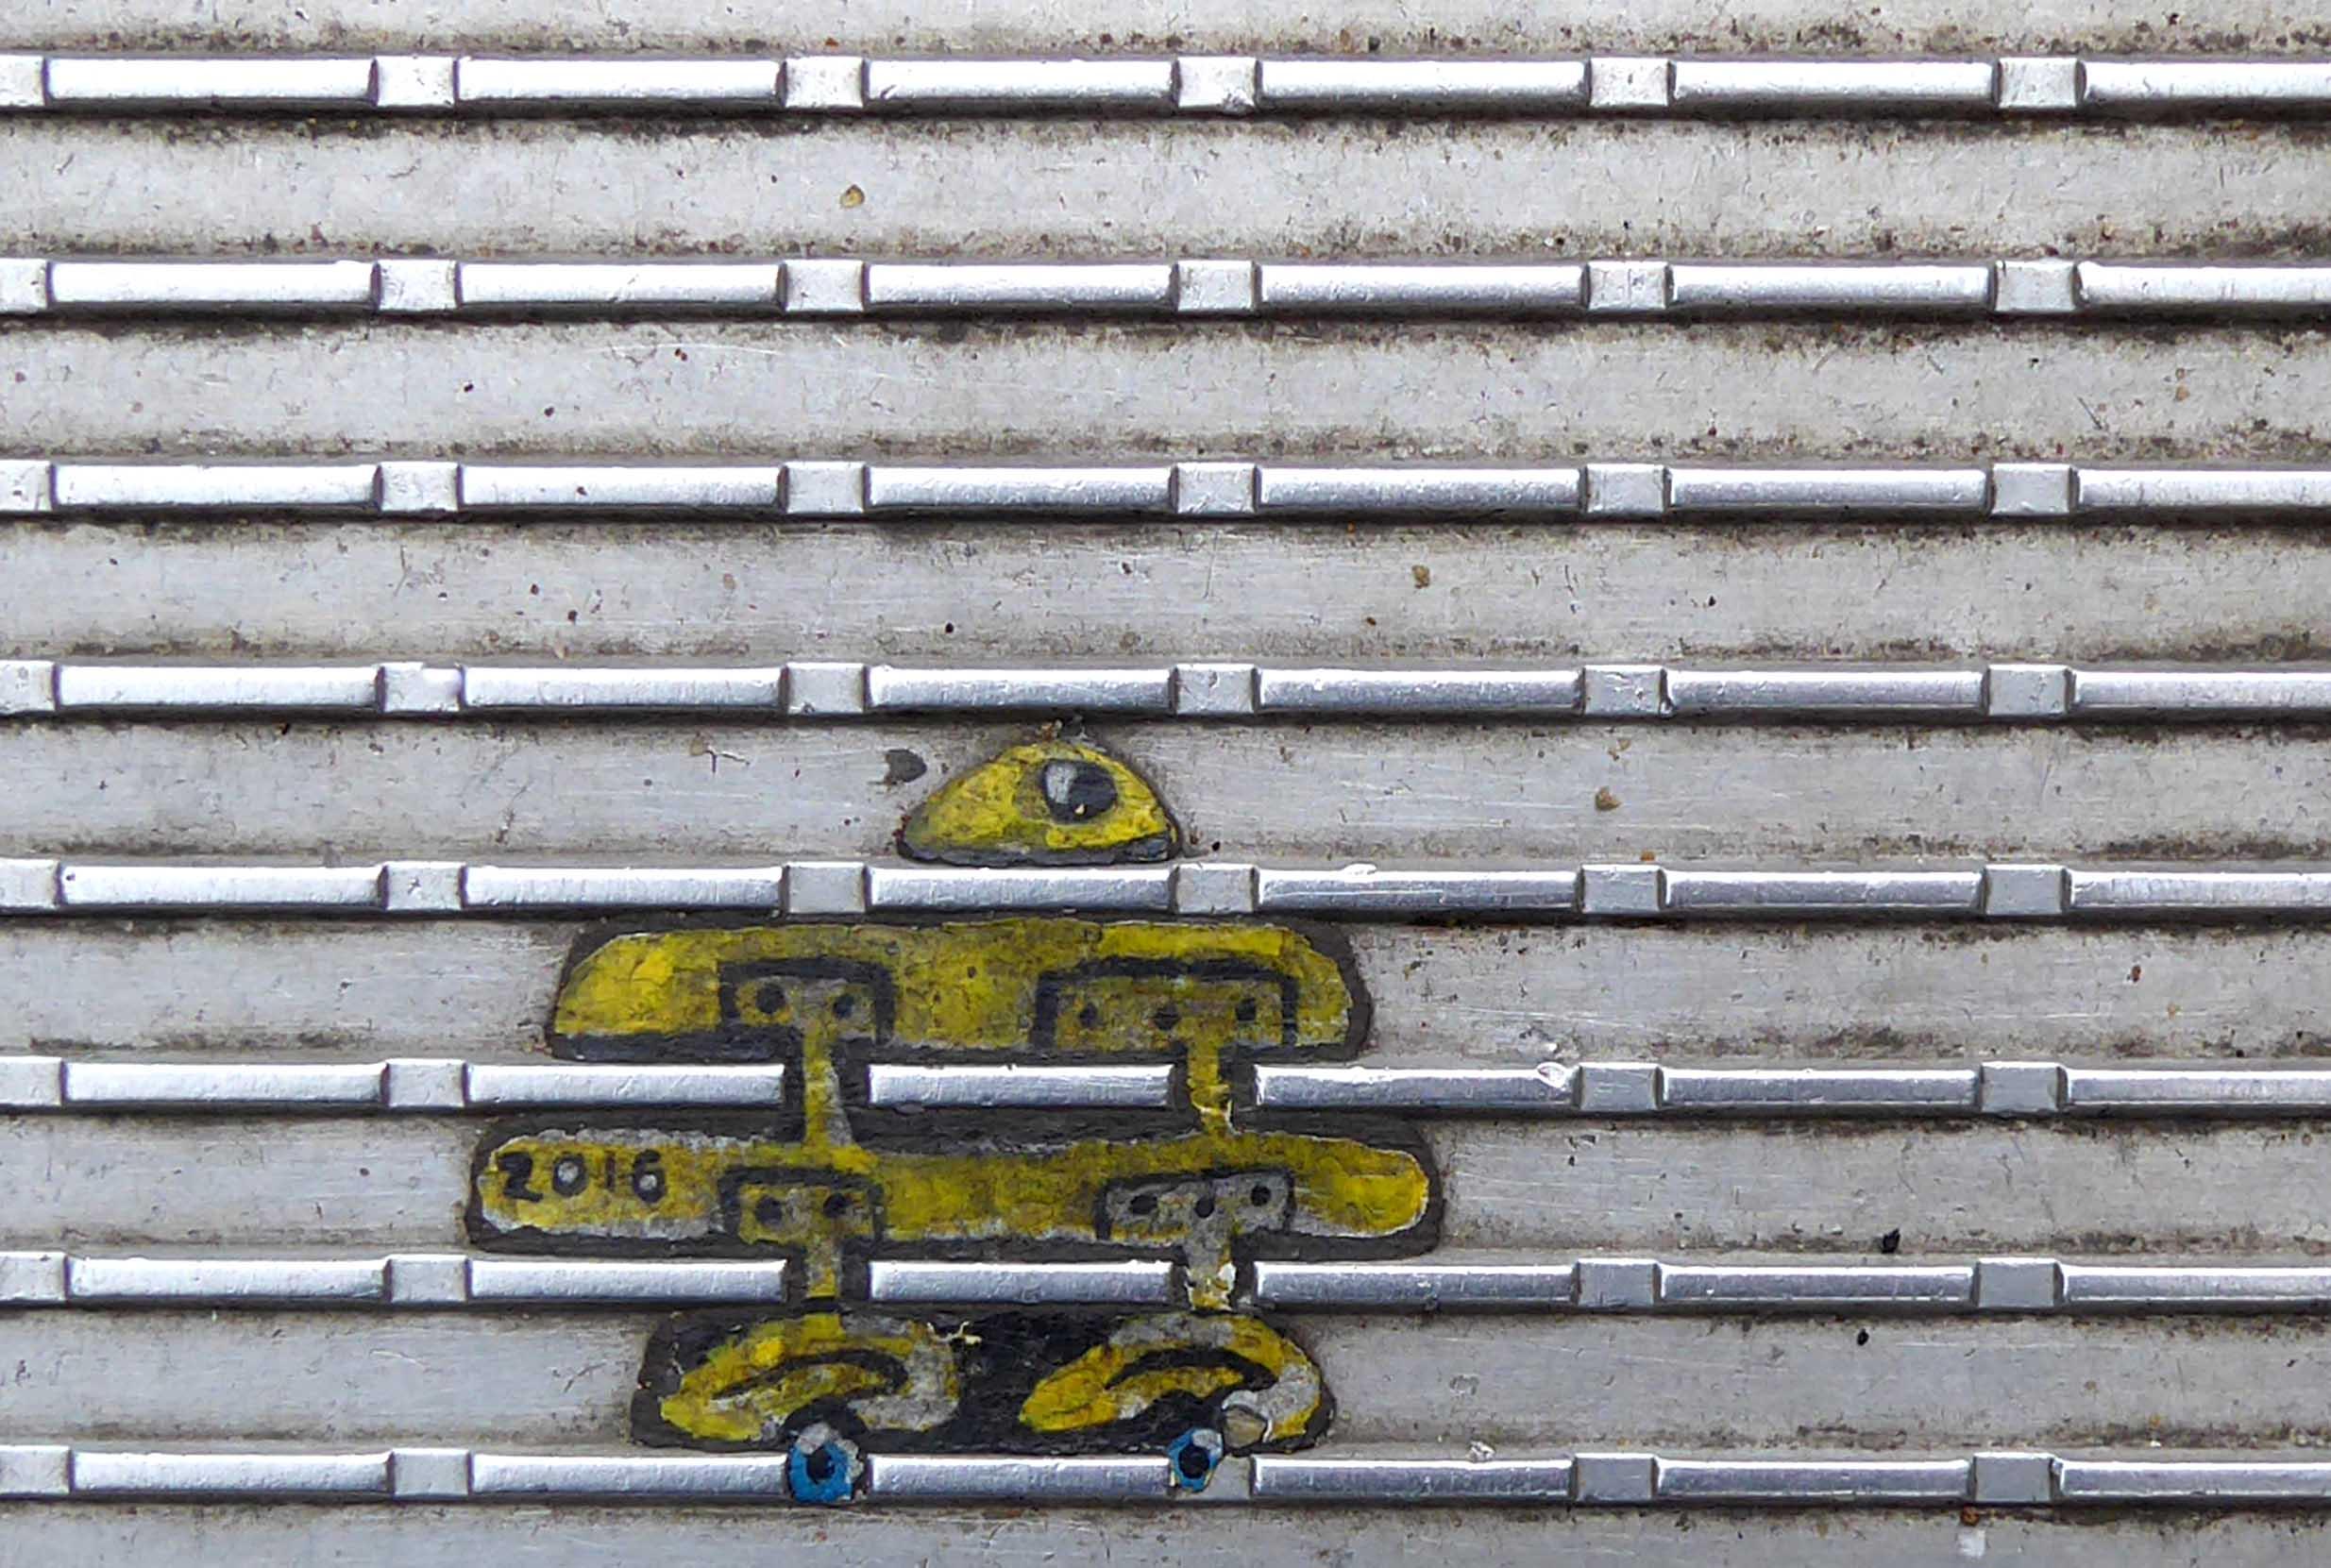 Tiny yellow painting on ridged metal surface